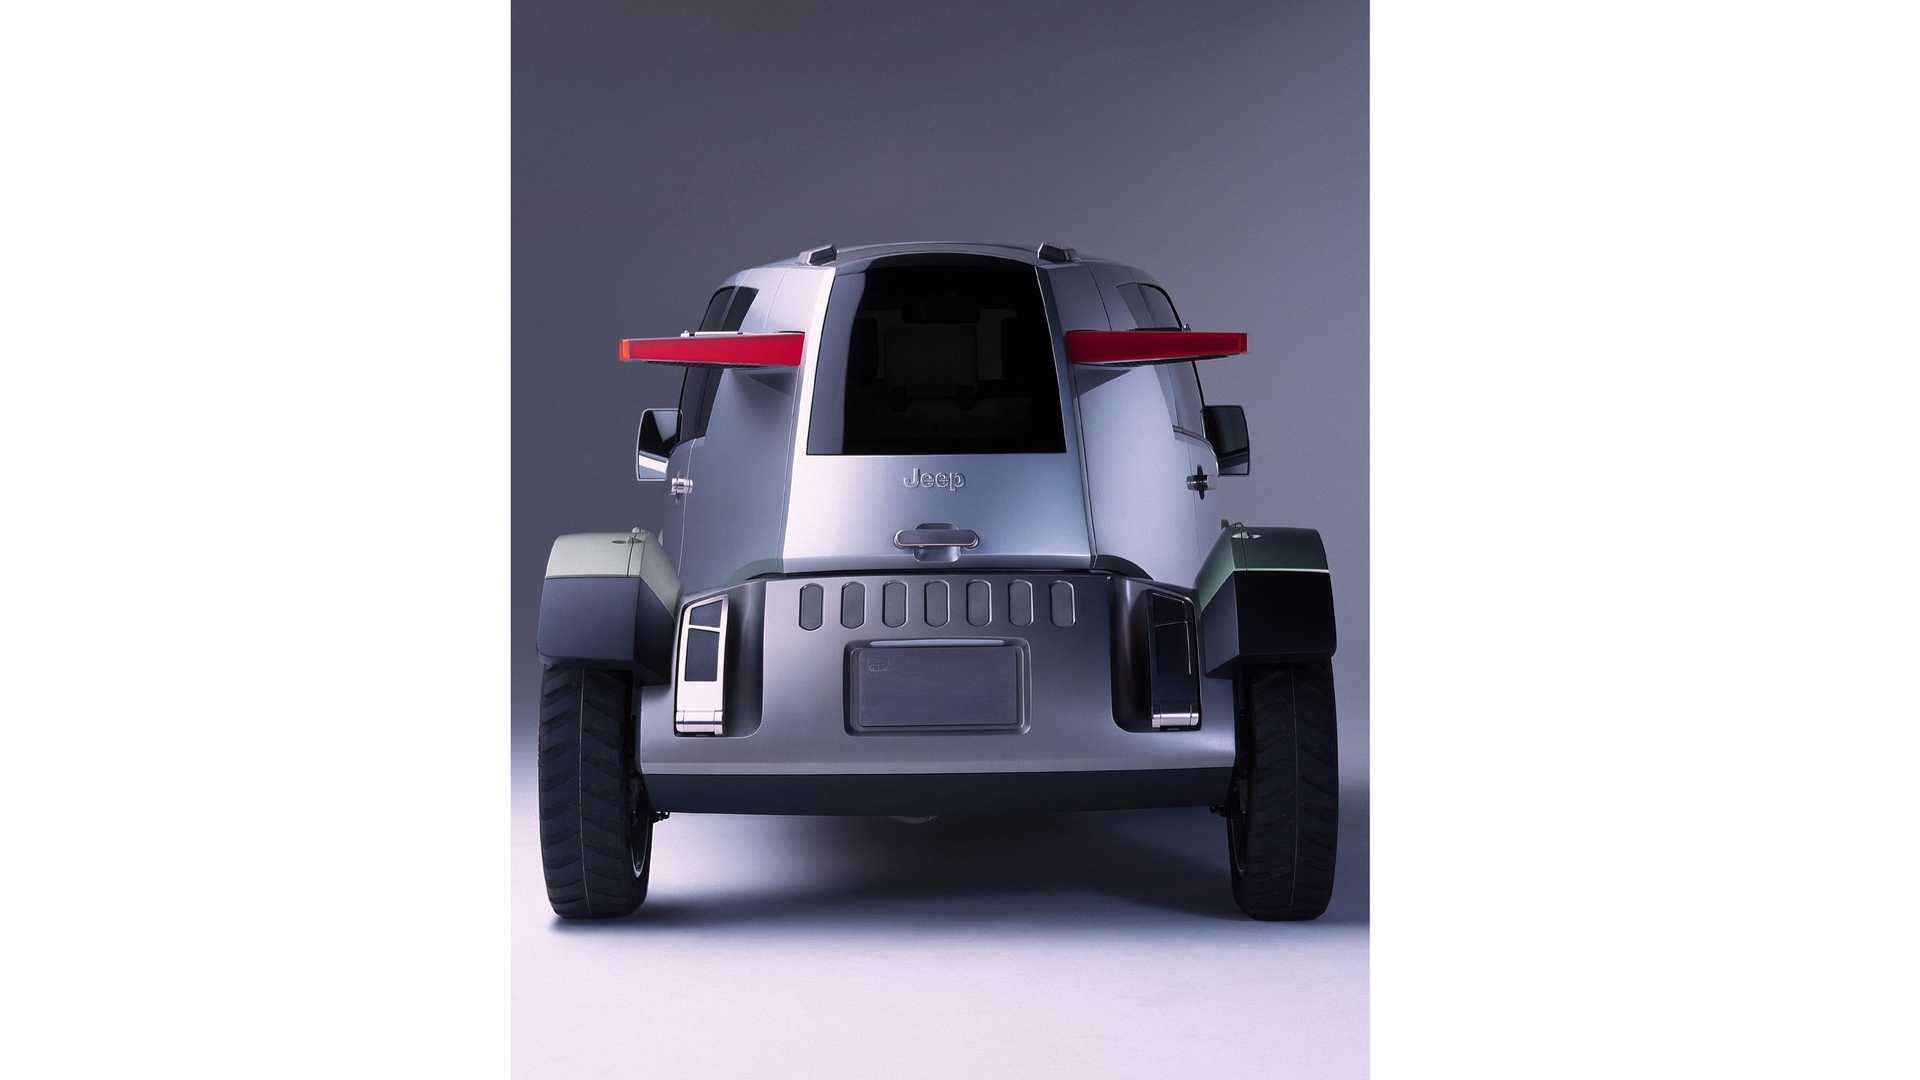 Jeep Treo concept 2003 (20)